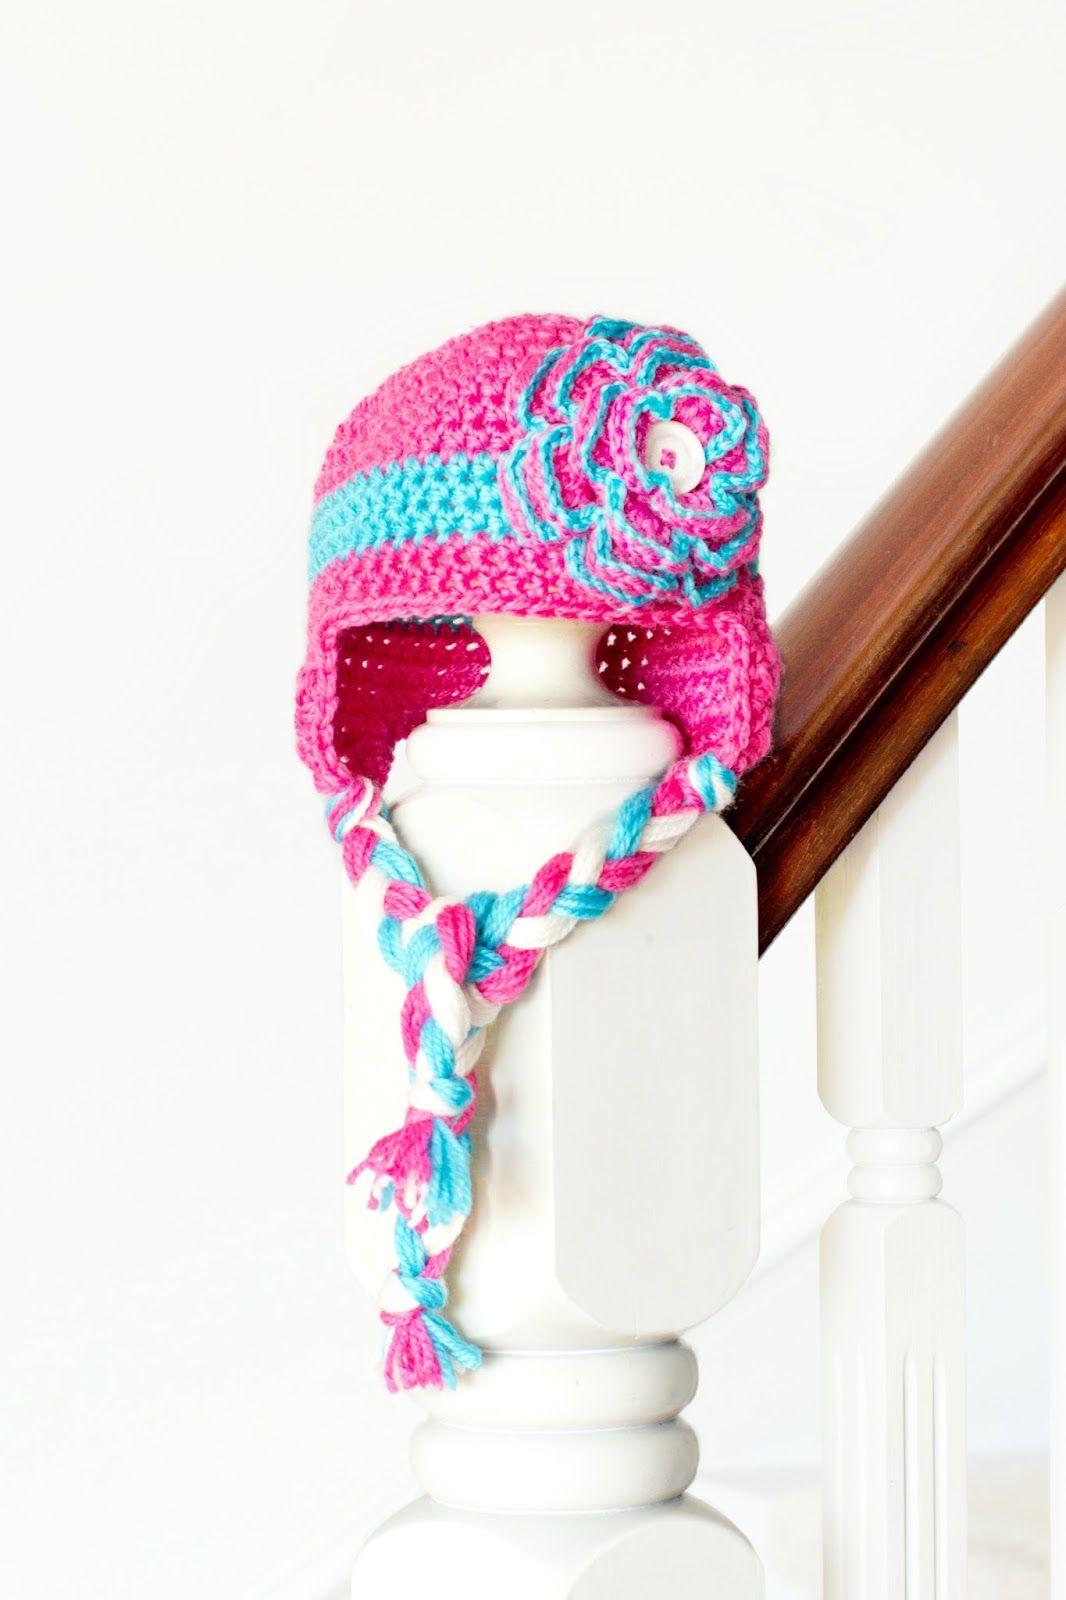 Floral Baby Earflap Hat Crochet Pattern | Sombreros de ganchillo ...